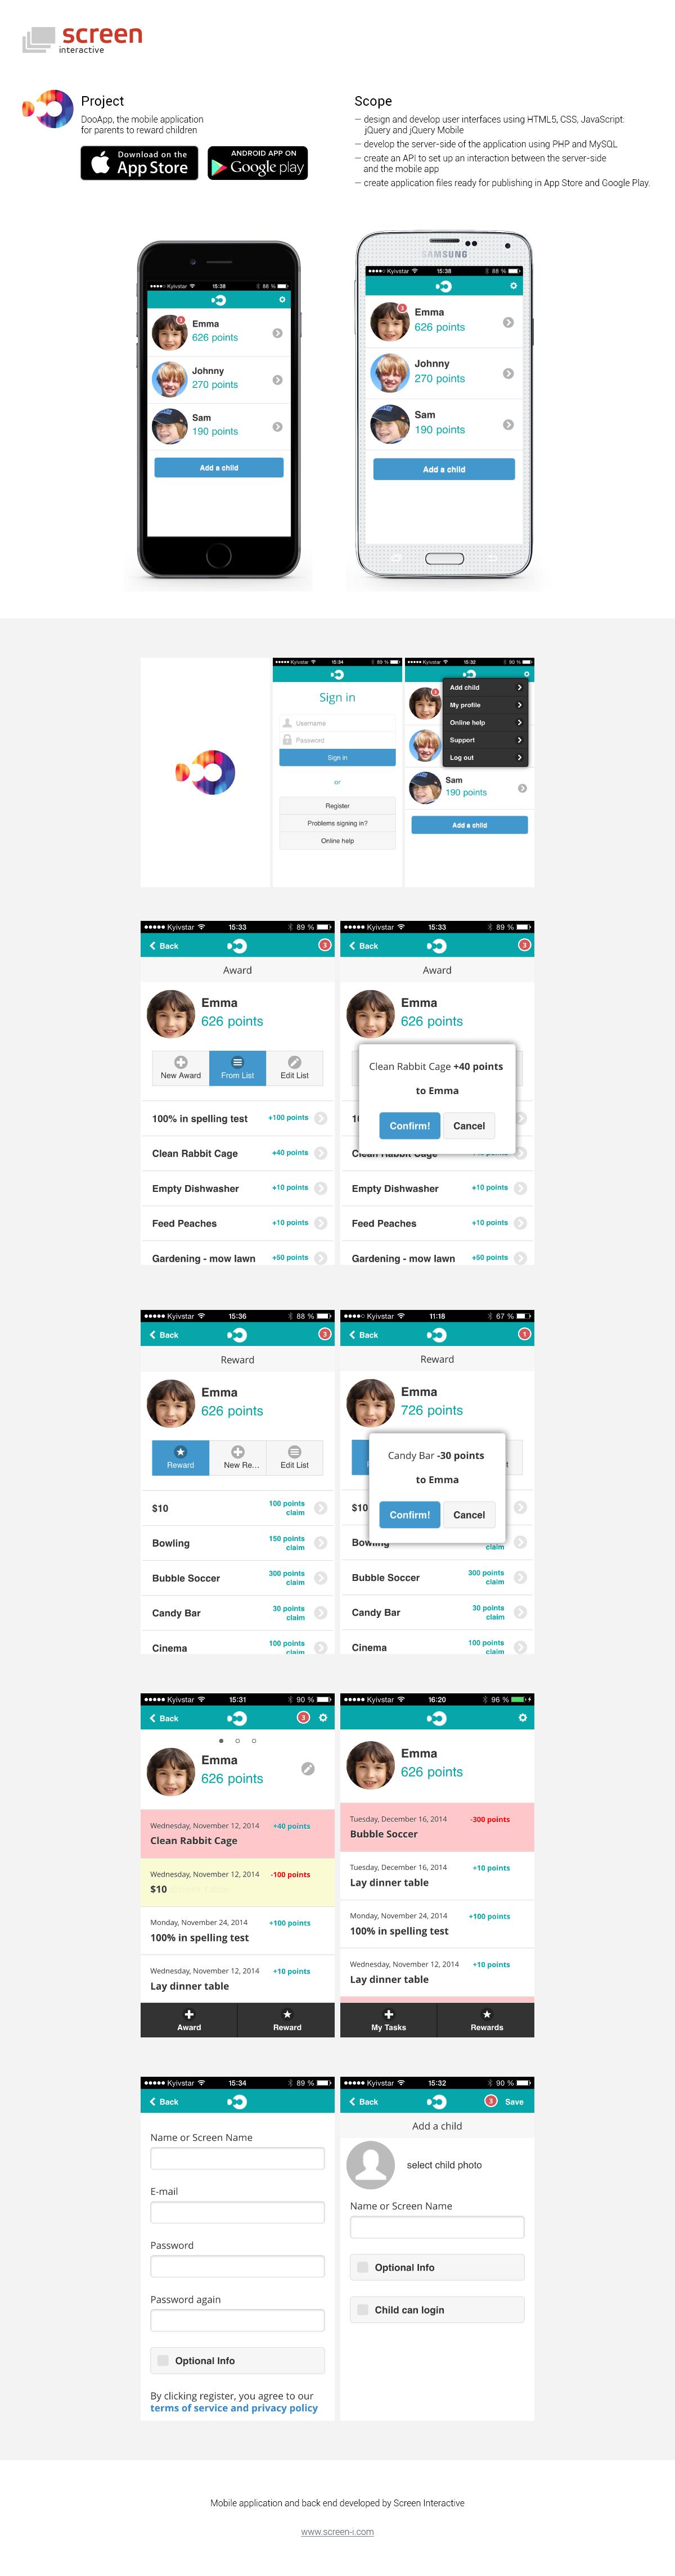 DooApp mobile application